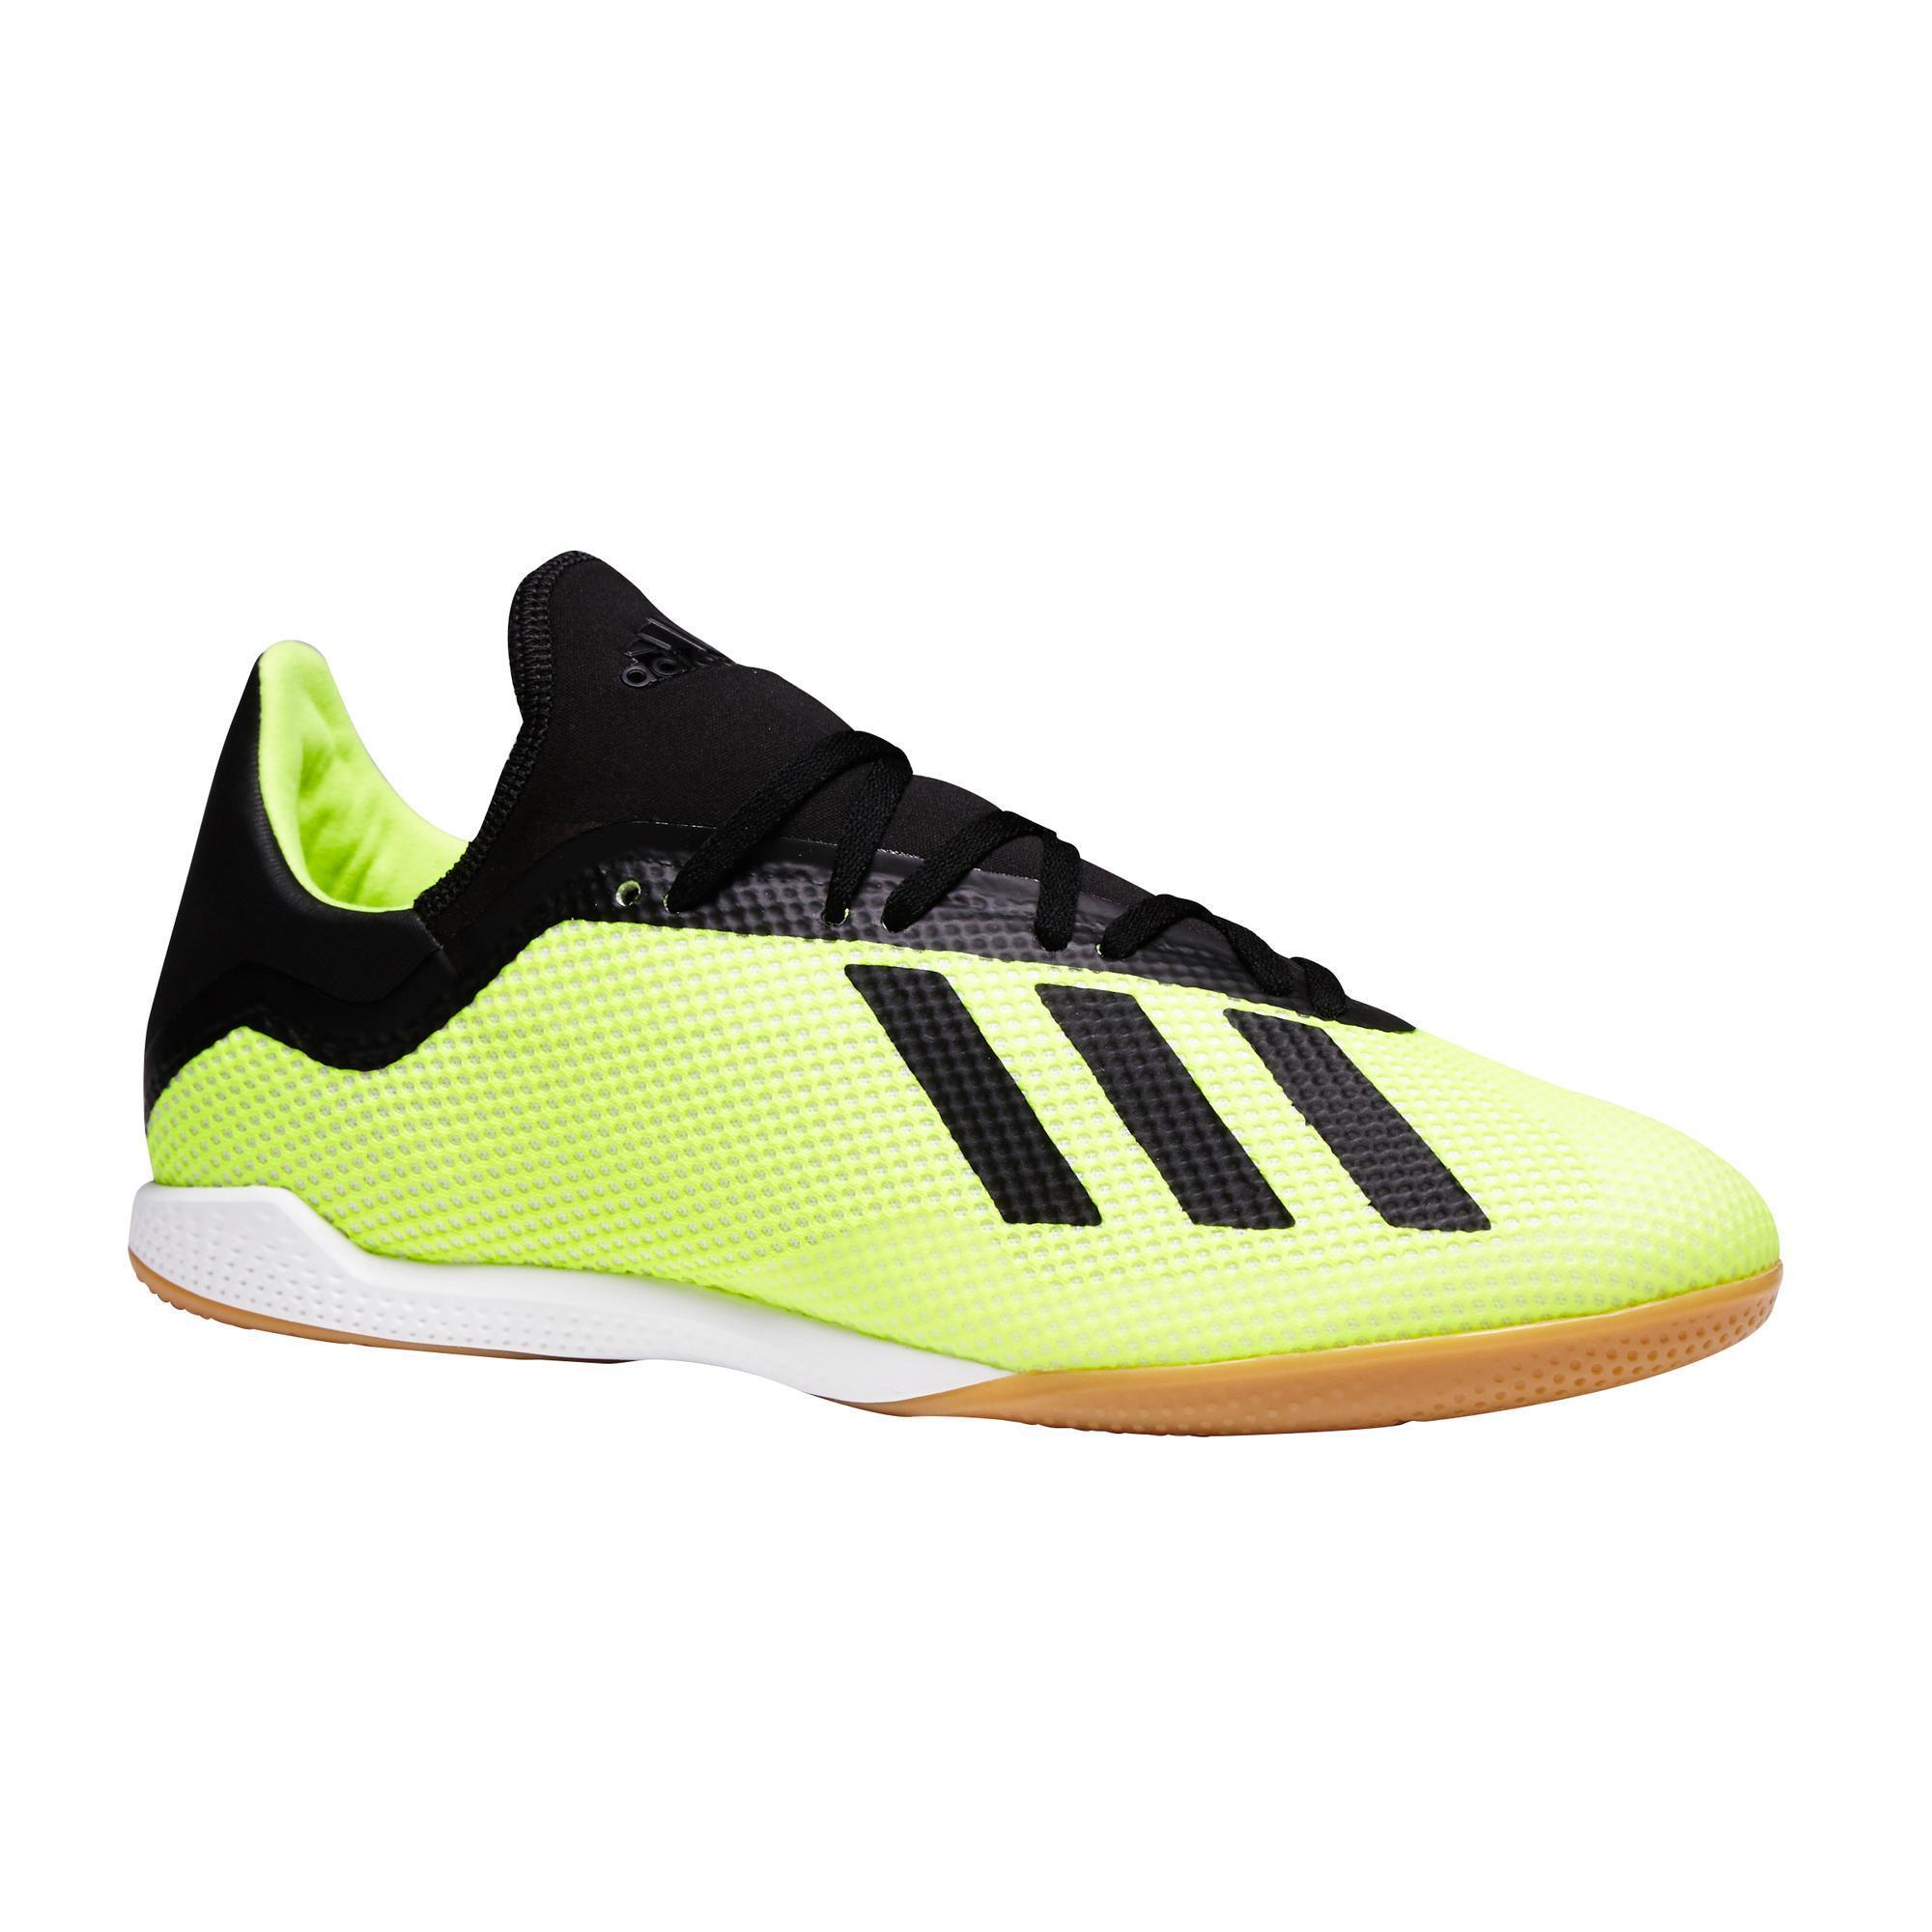 Adidas Zaalvoetbalschoenen X Tango 18.3 sala geel-zwart